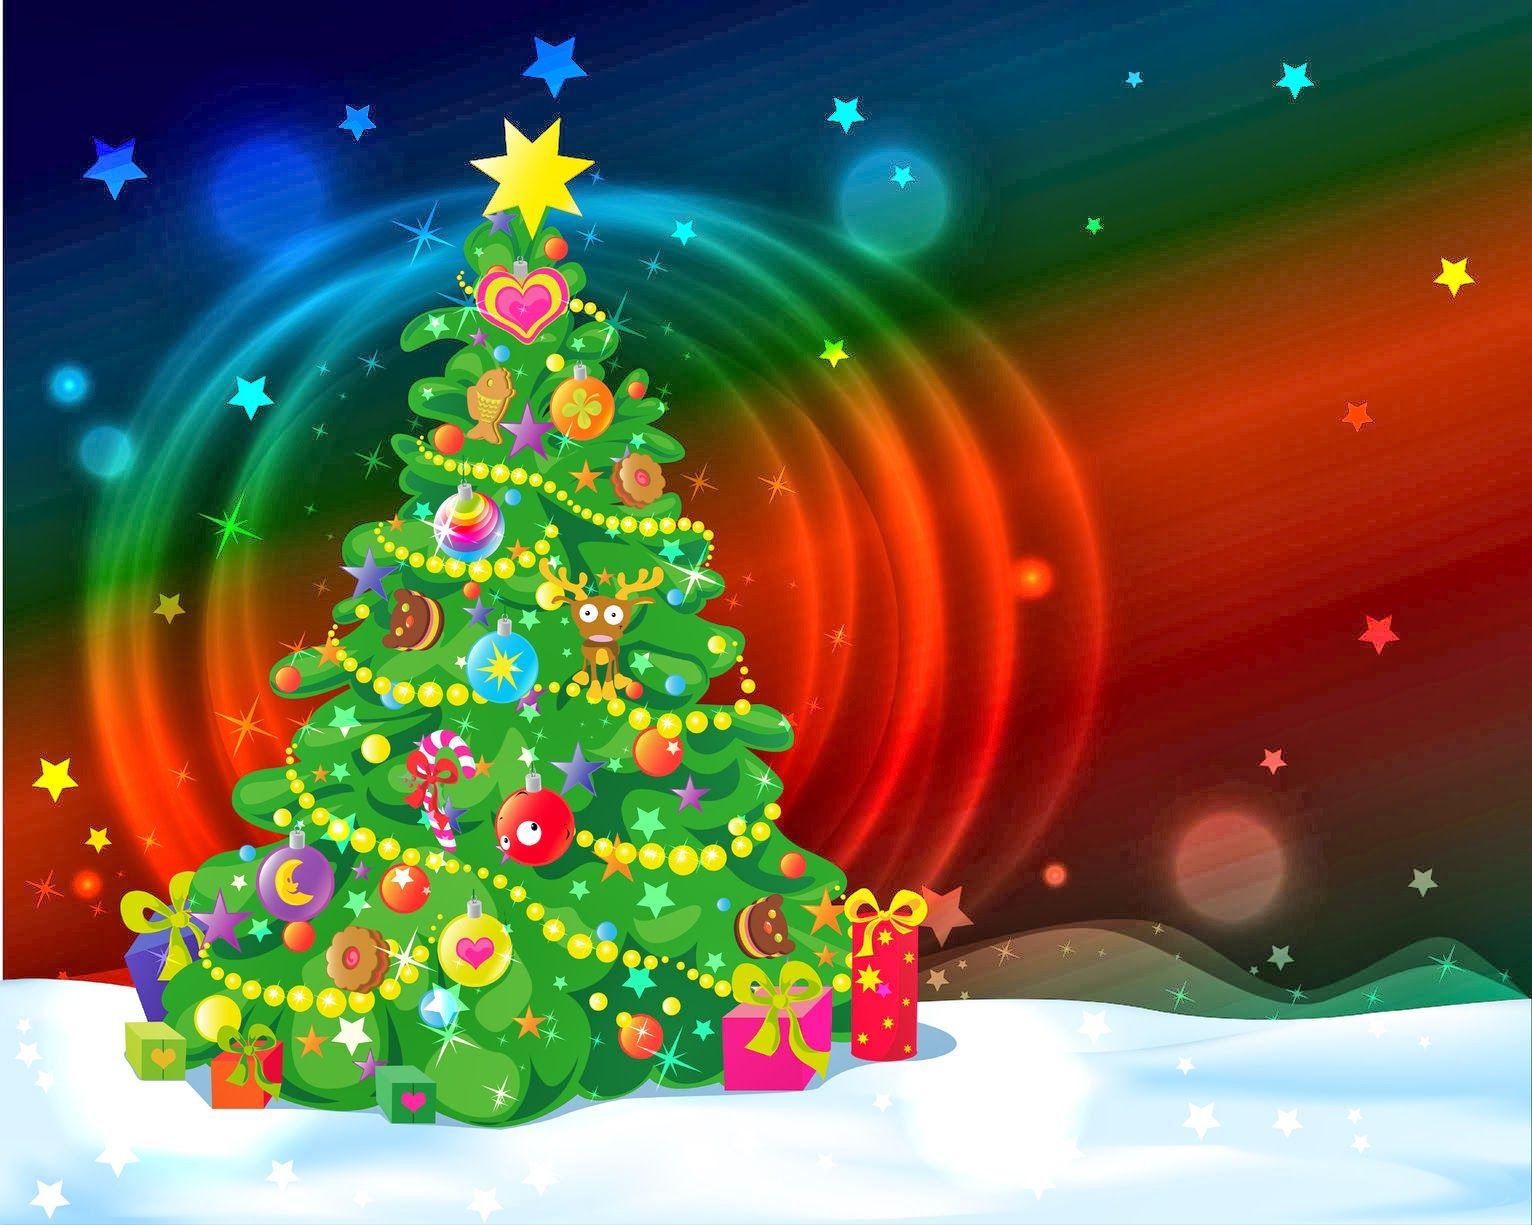 Fondos De Pantalla De Navidad: FrasesparatuMuro.com: Fondos Navideños Para Pantalla